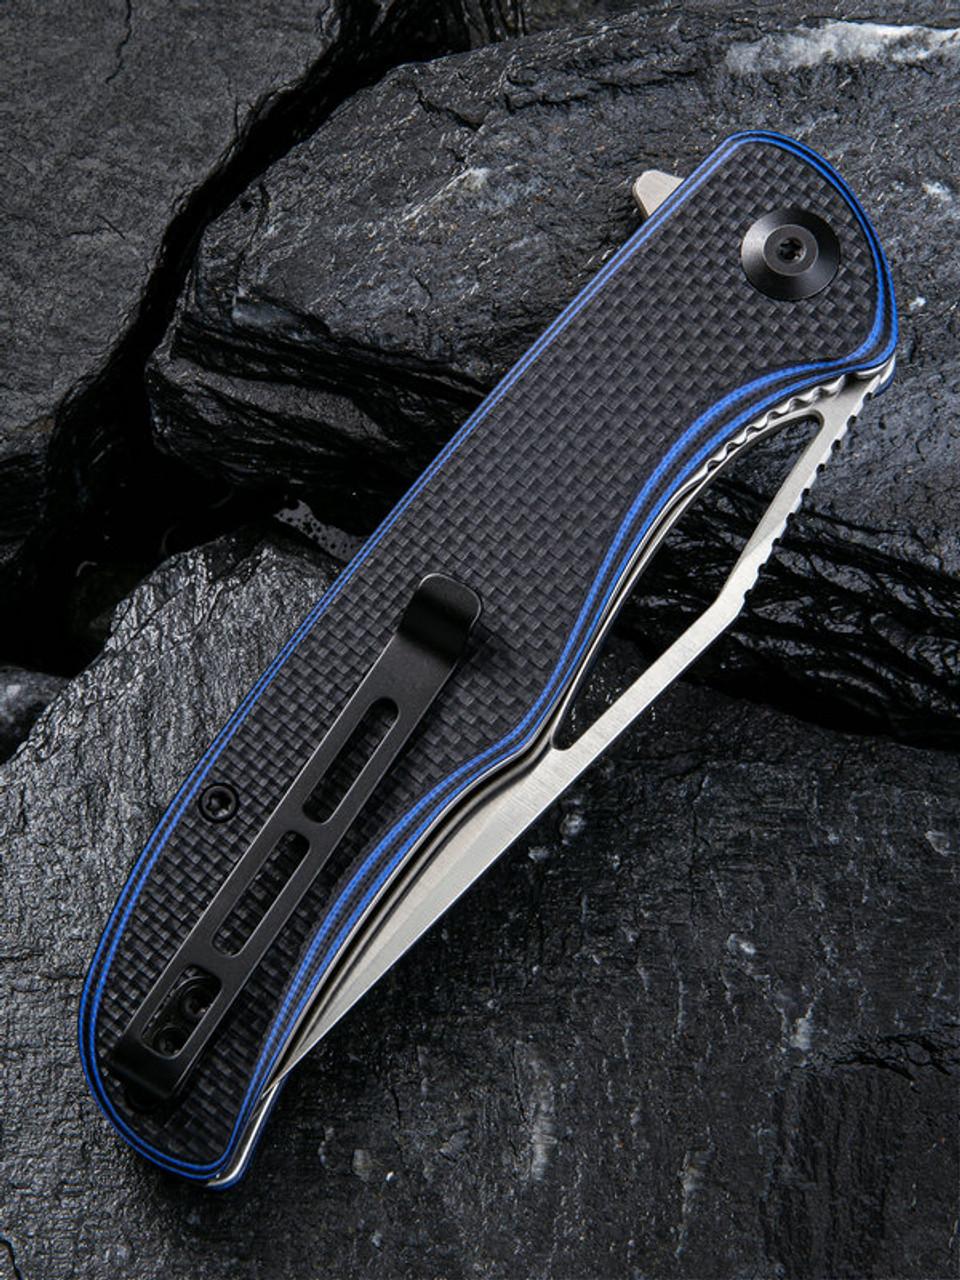 "Civivi Shredder Linerlock Folder C912A, 3.70"" D2 Satin Clip Point Plain Blade, Blue and Black Layered G10 With A Coarse Texture Handle"